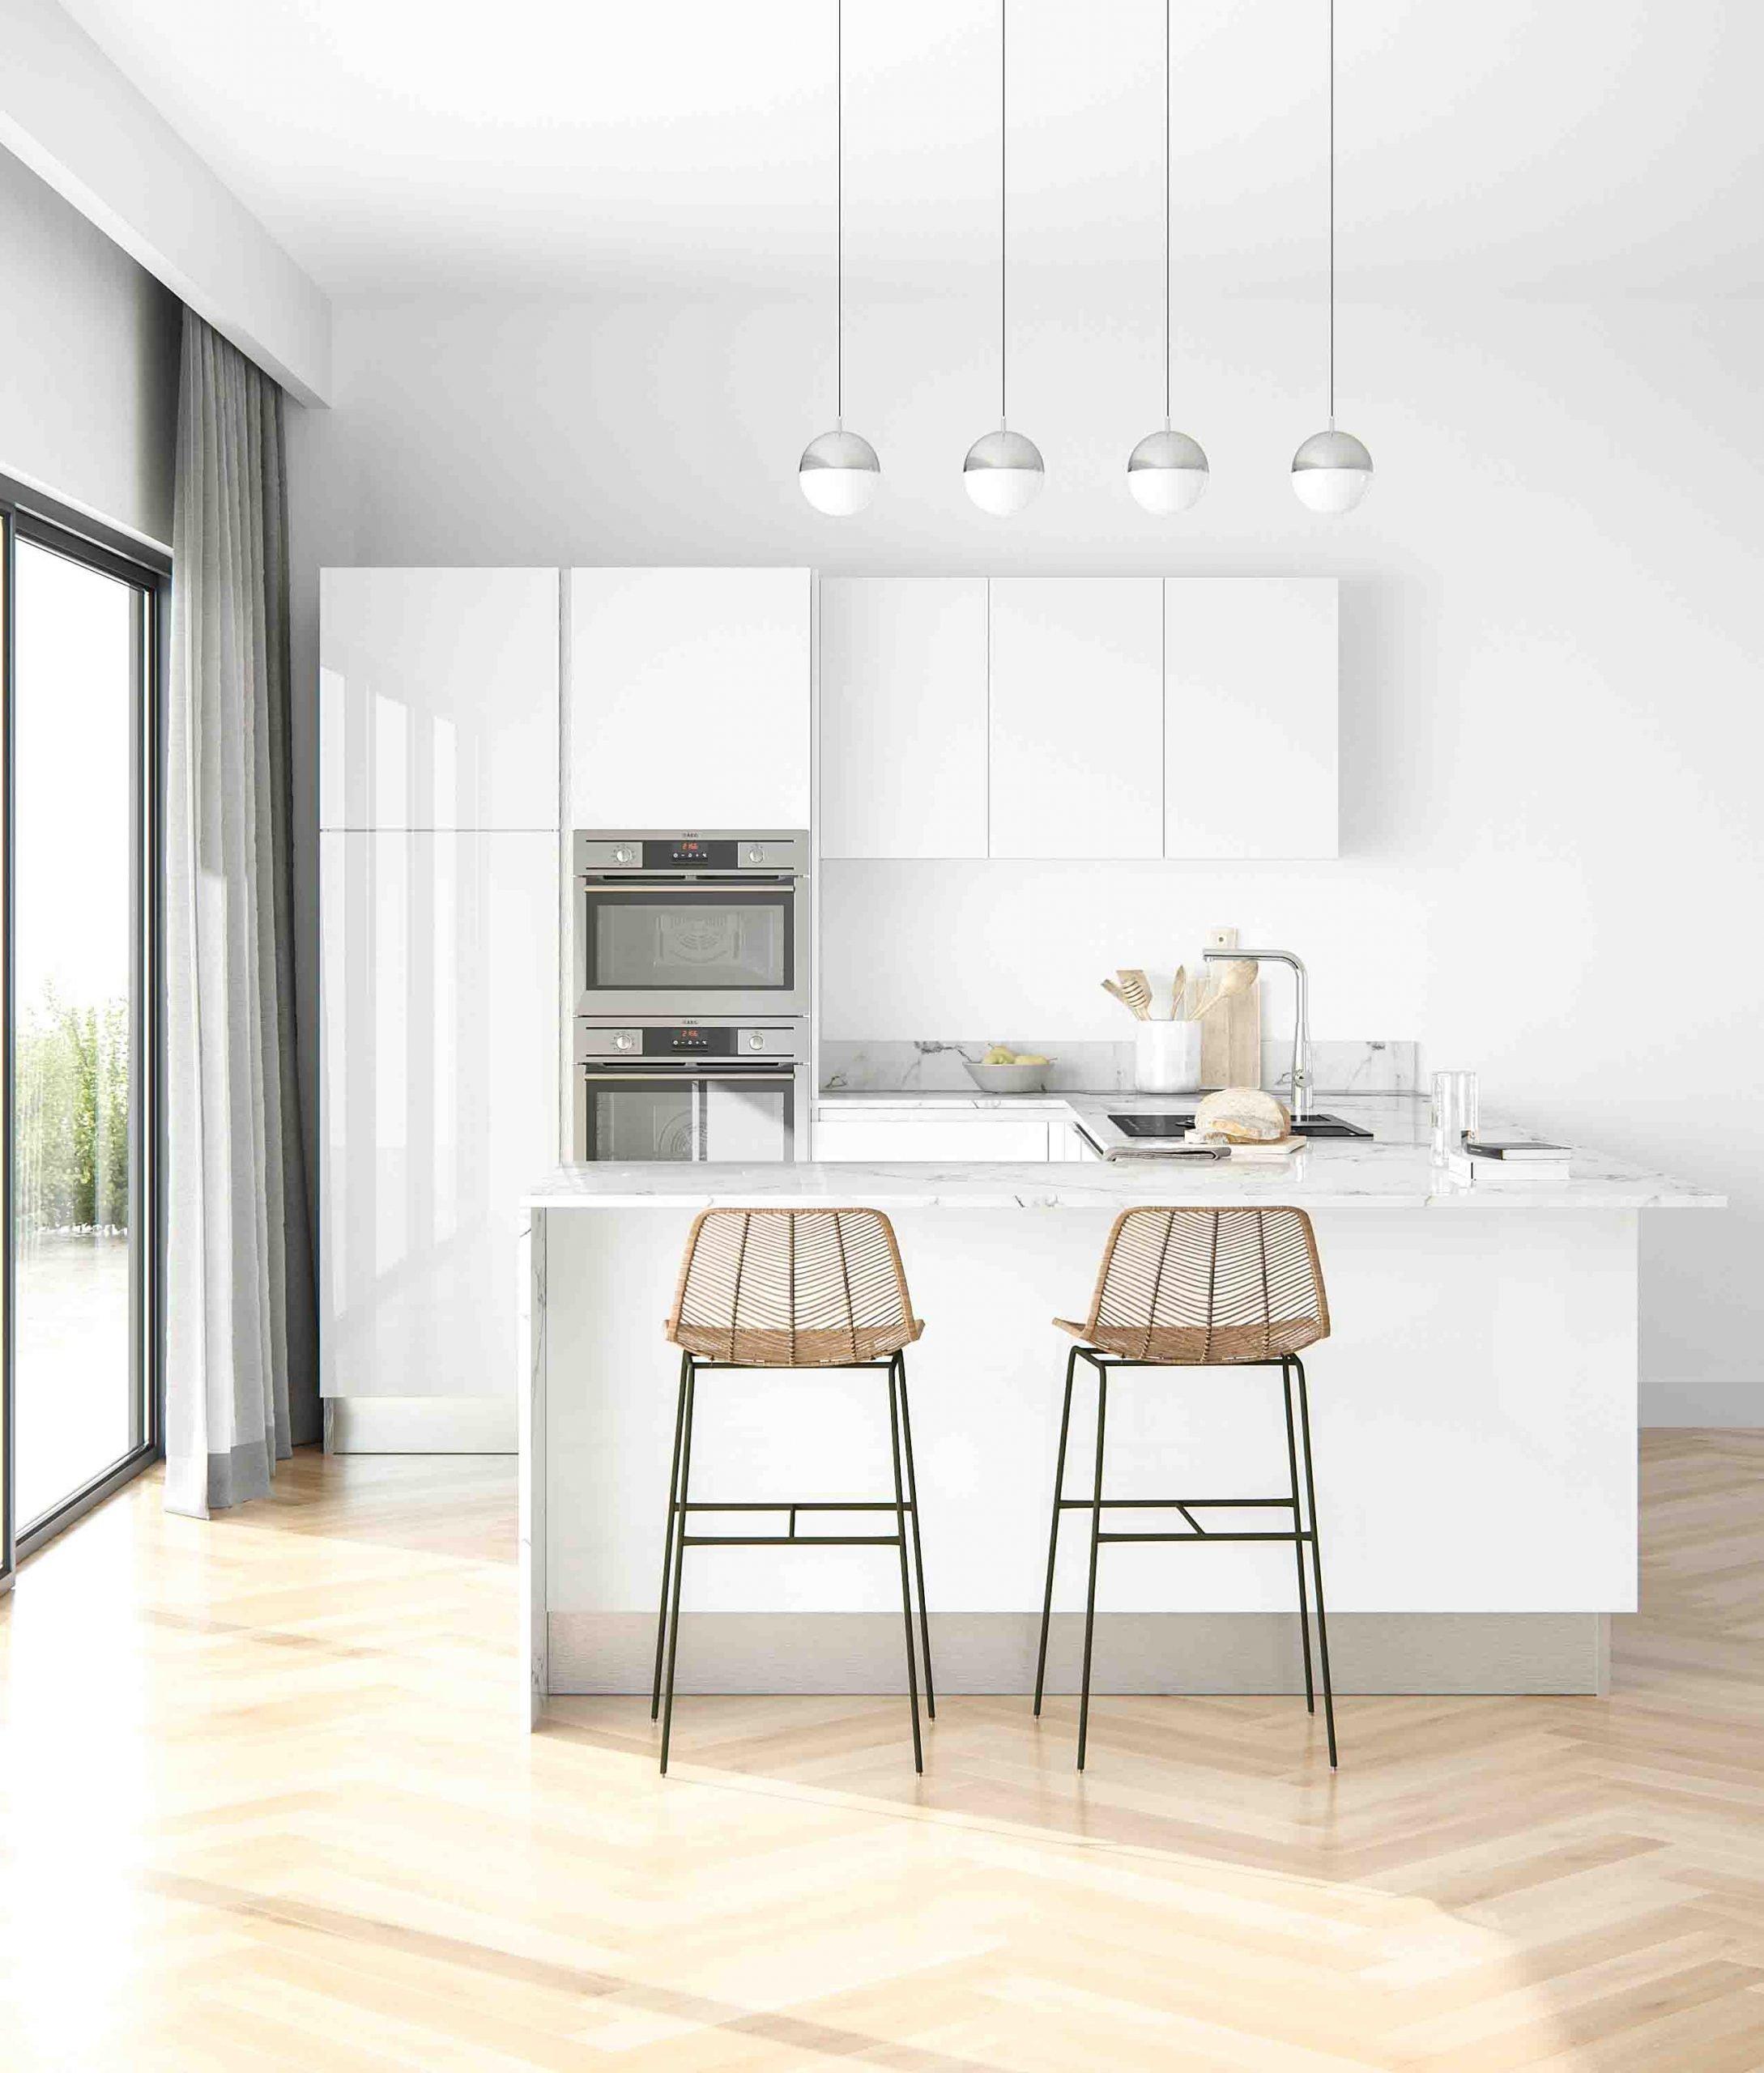 https://dprostudio.com/wp-content/uploads/2021/01/GRIXTI01_kitchen_blanche_hq_cam3-scaled.jpg